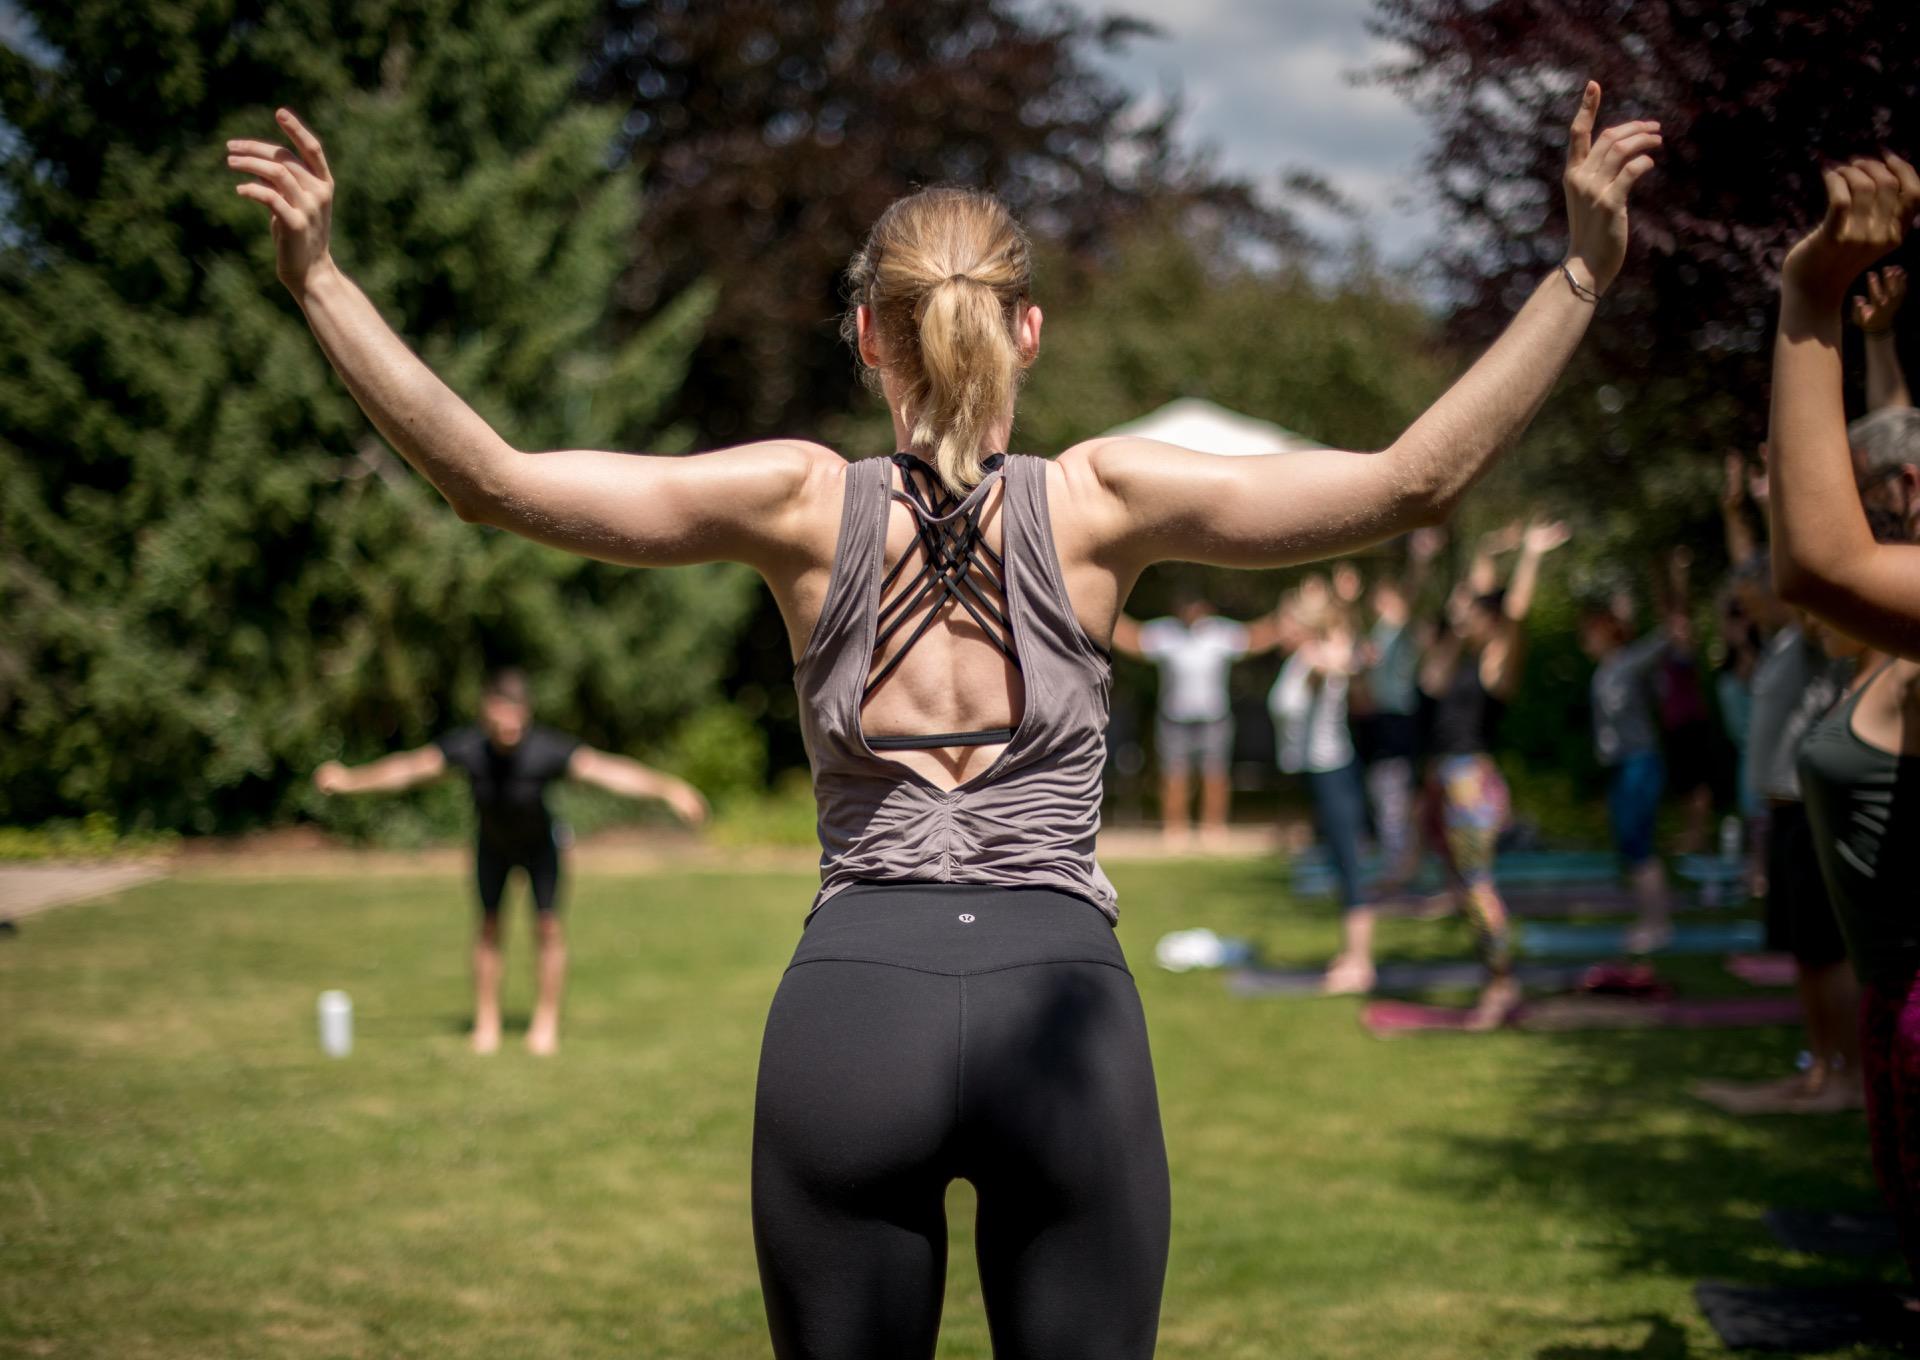 Hie-Kim-Friends-2019-Yoga-Retreat-Alina-Matis-Photography-069 - Hie Kim Yoga - Yoga Retreat - Yoga Workshops und Reisen